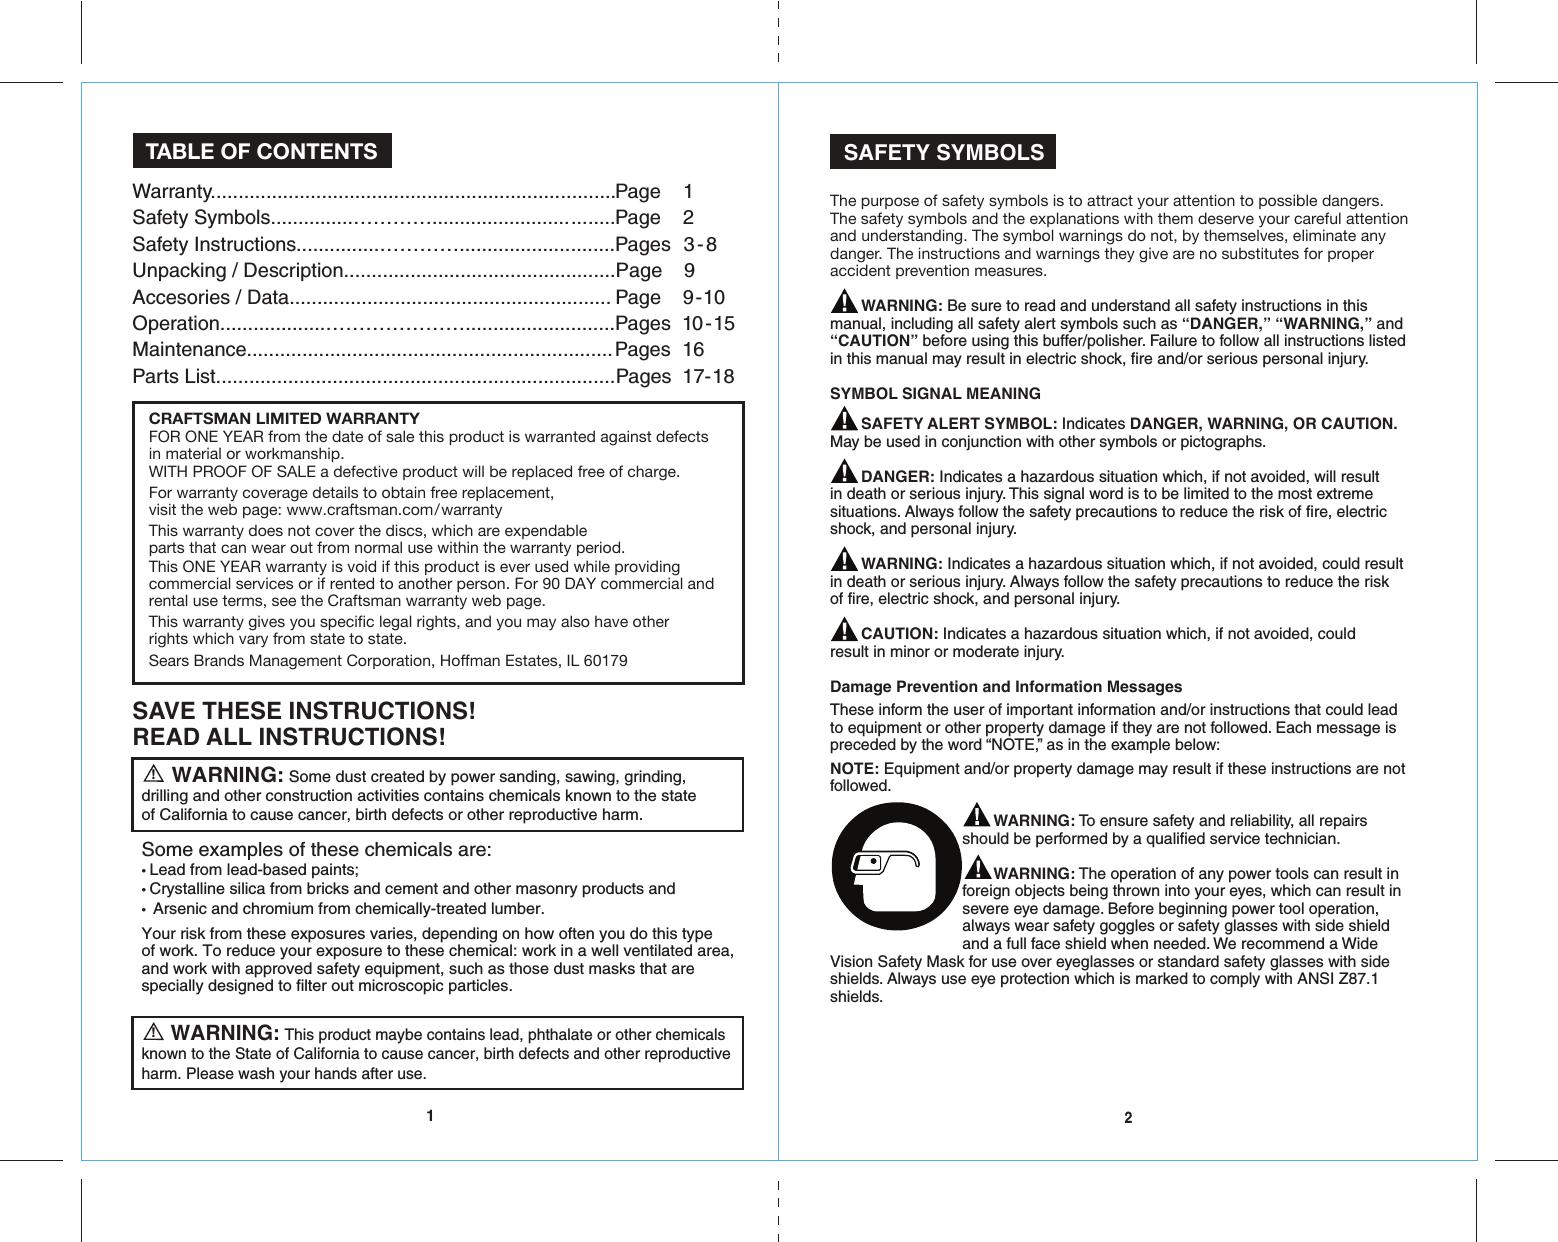 Craftsman 172417750 4177510agrinderengmanualreadersrev 5 31 page 2 of craftsman 172417750 4177510agrinderengmanualreadersrev 5 31 16 user manual grinder angle buycottarizona